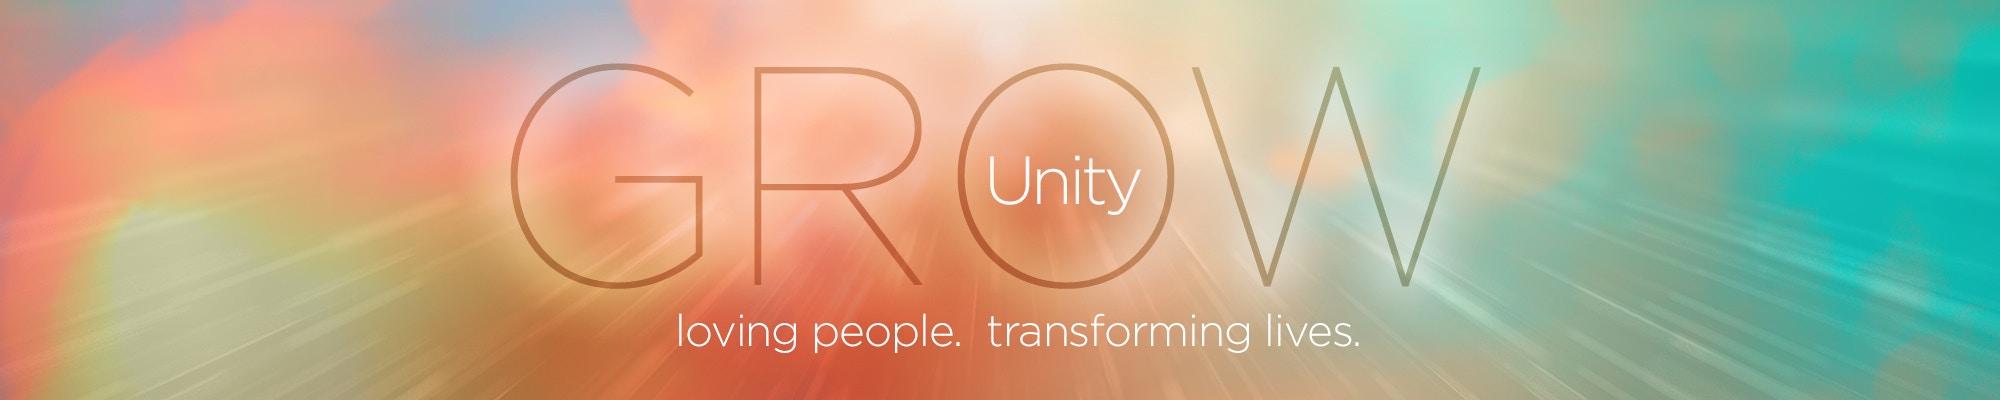 Grow Unity